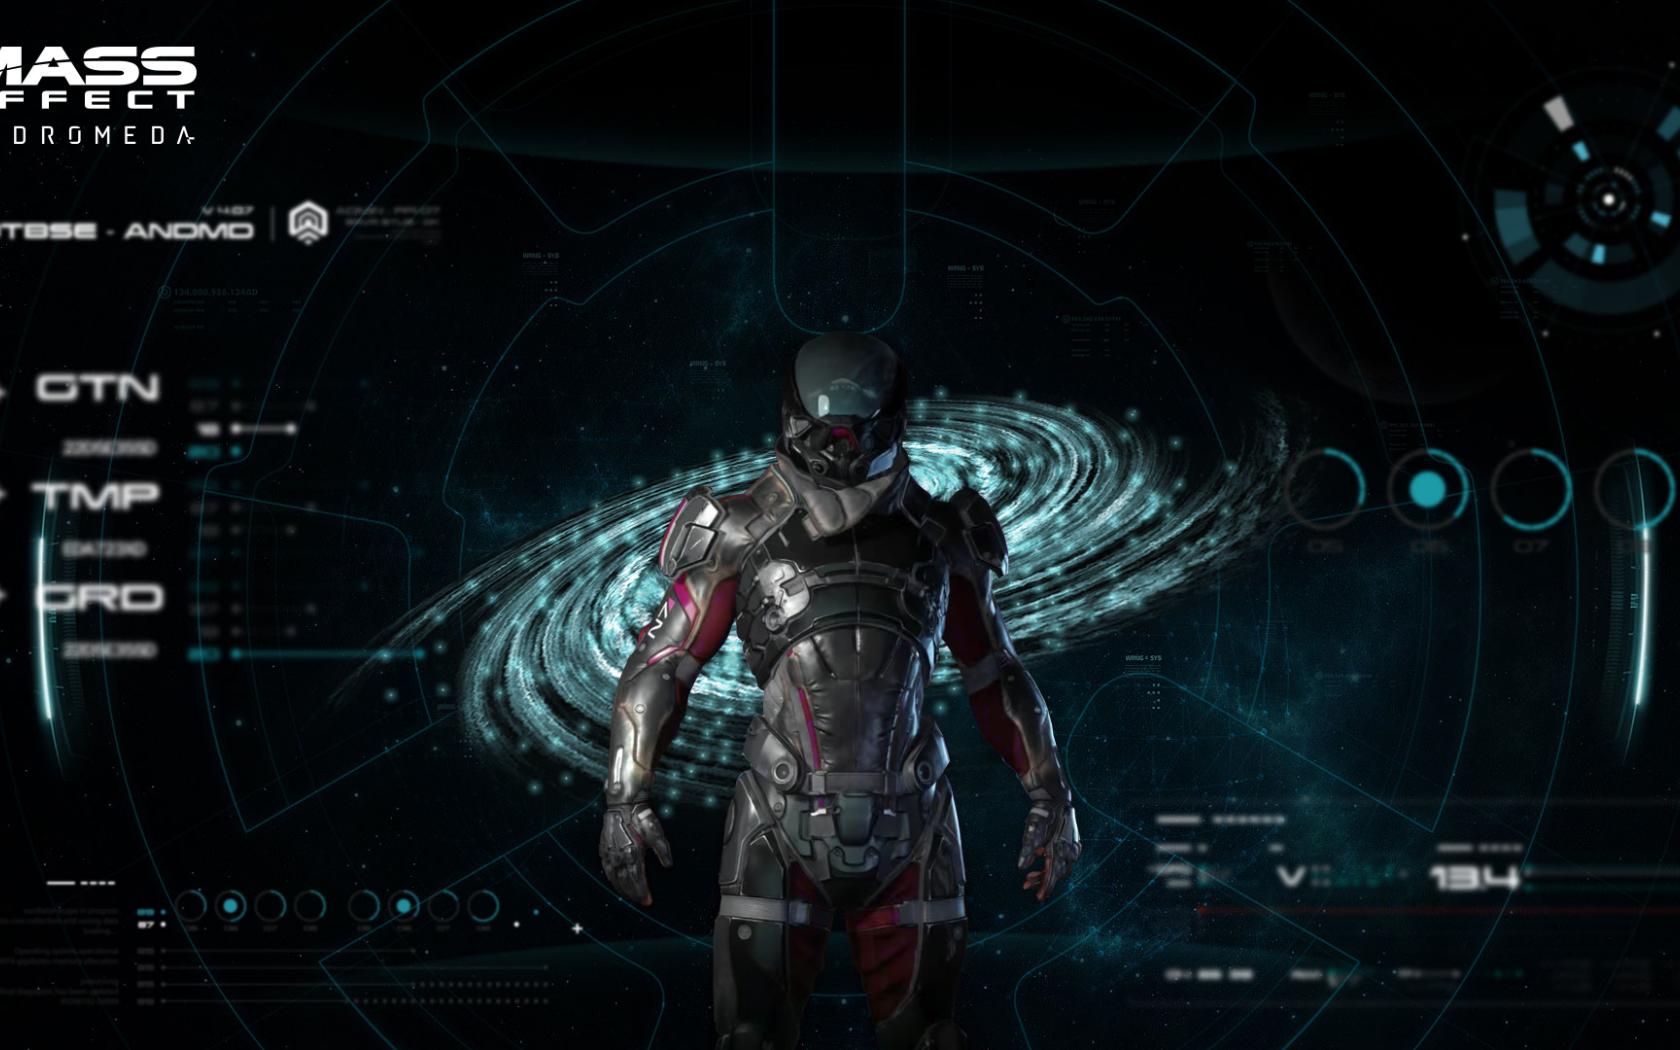 Free Download Mass Effect Andromeda Wallpaper By Jackshepardn7